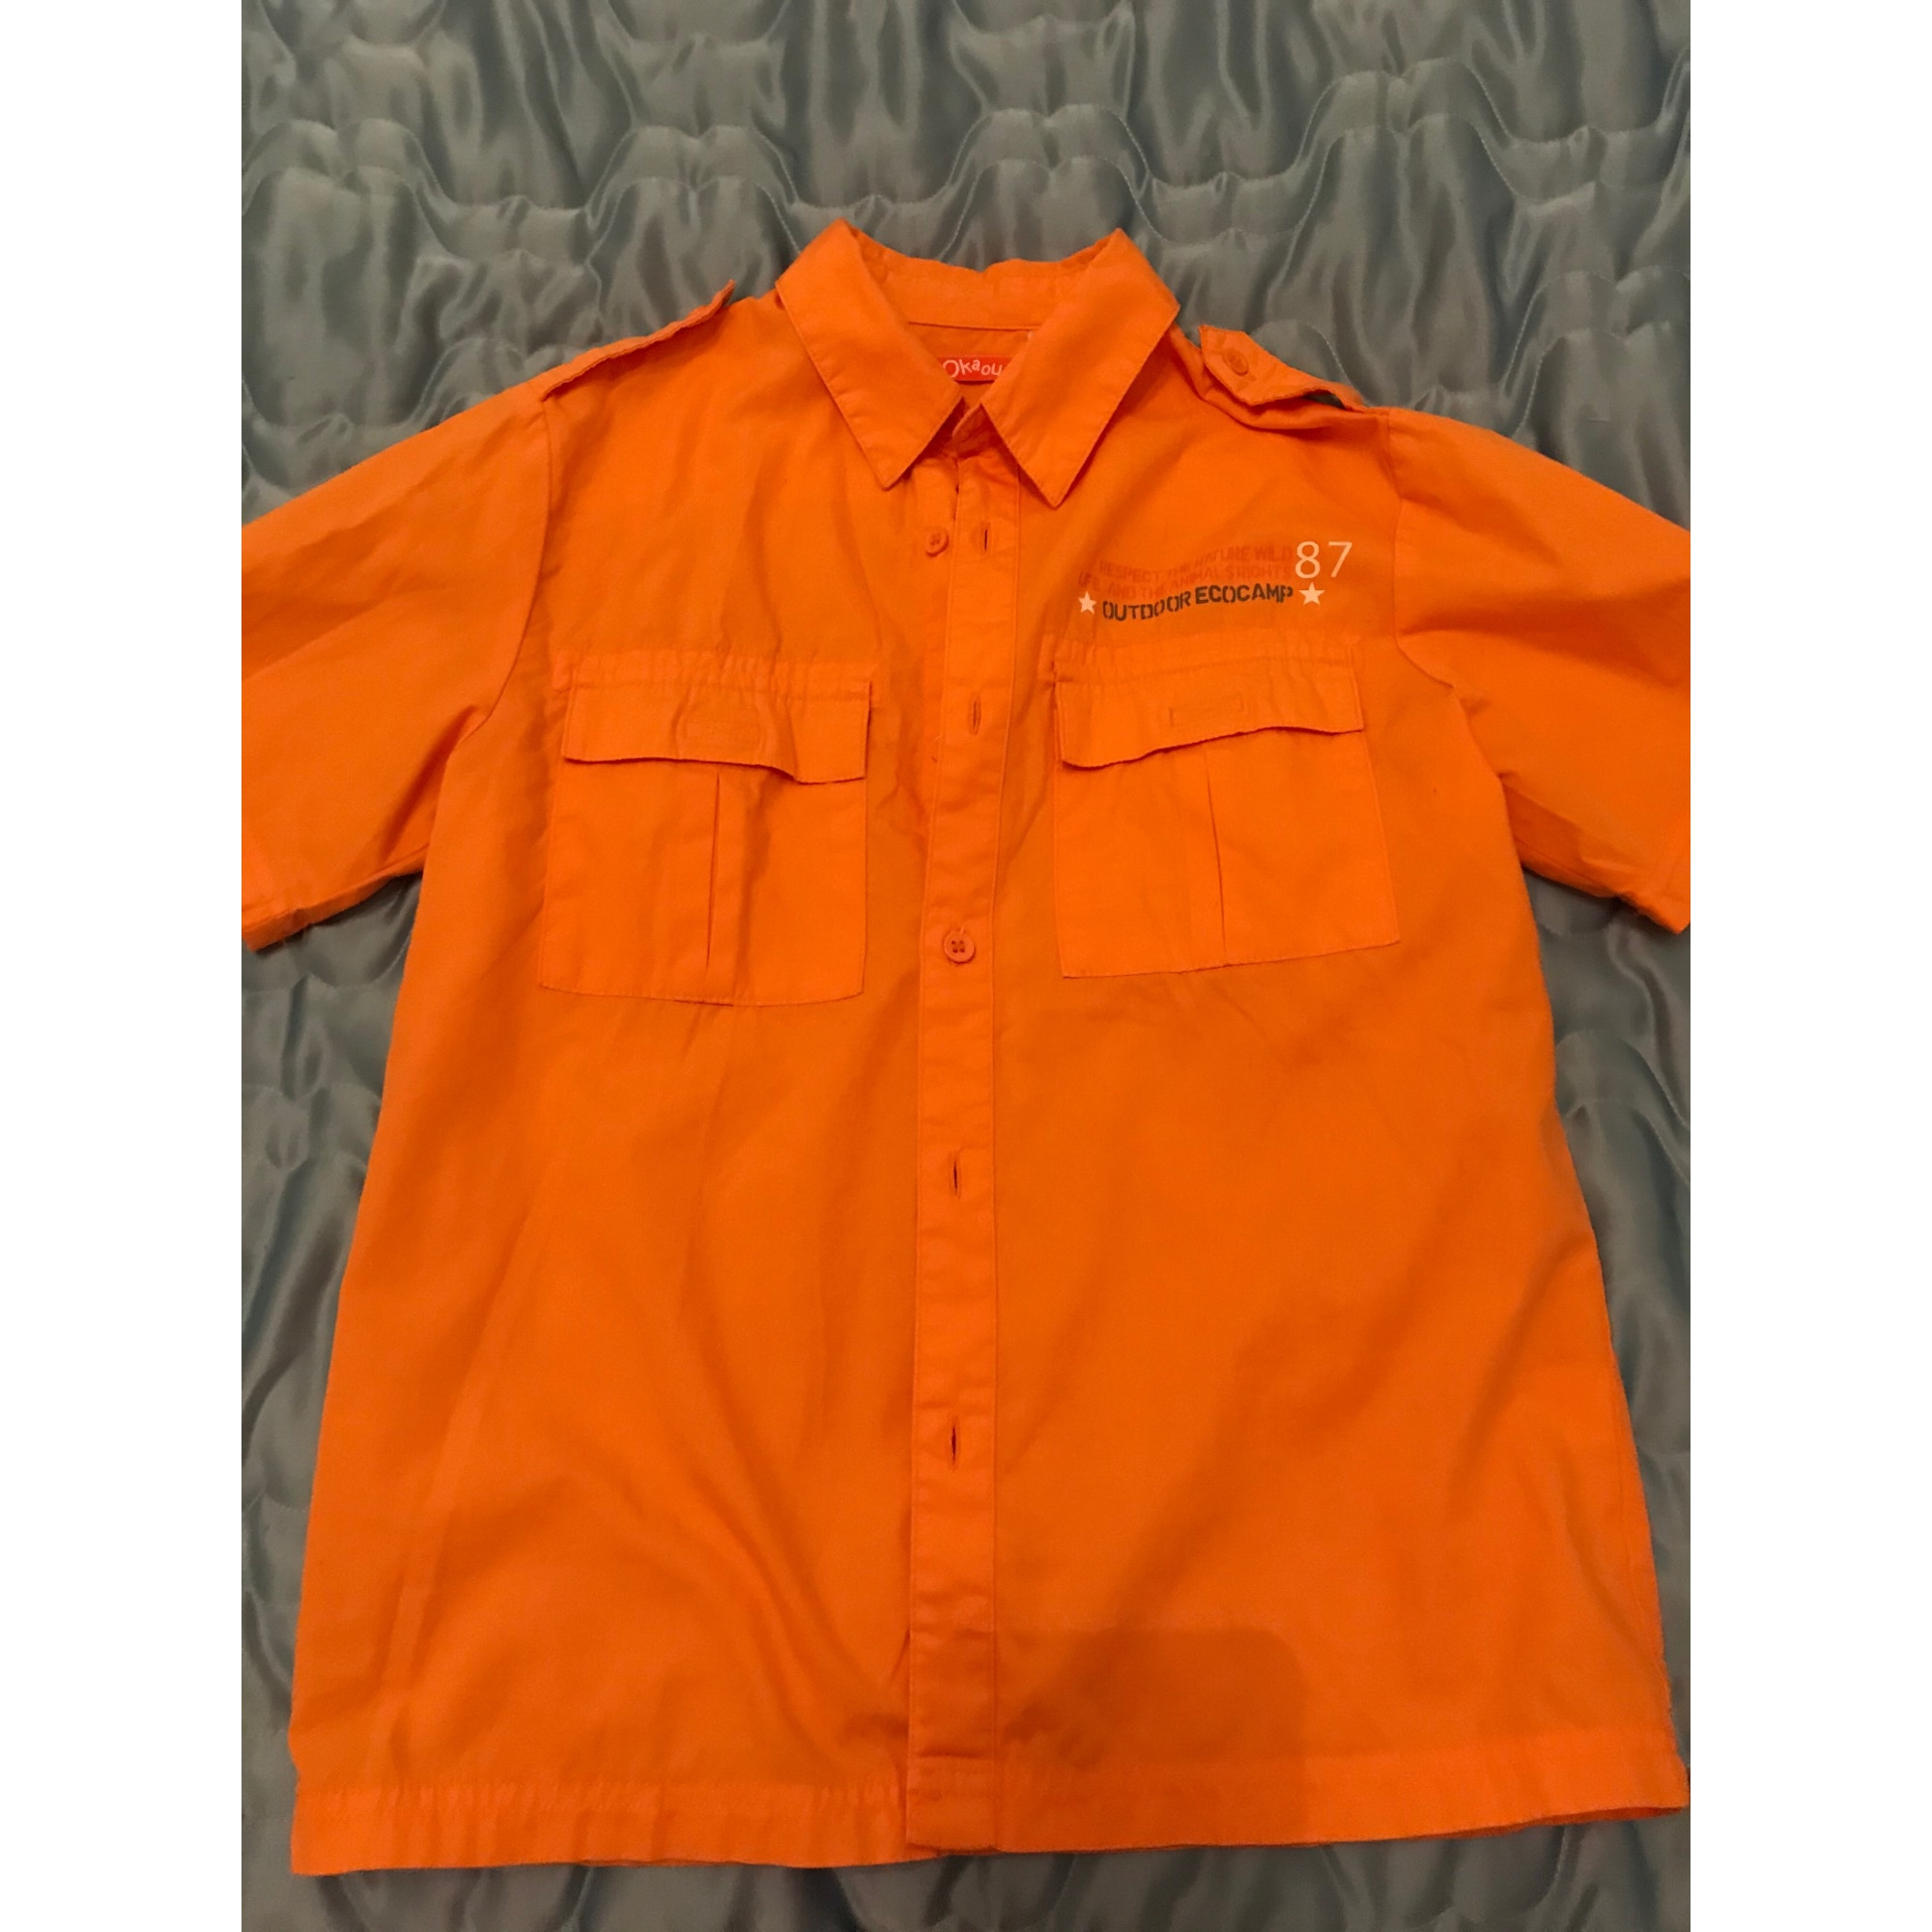 Chemisette OKAOU Orange